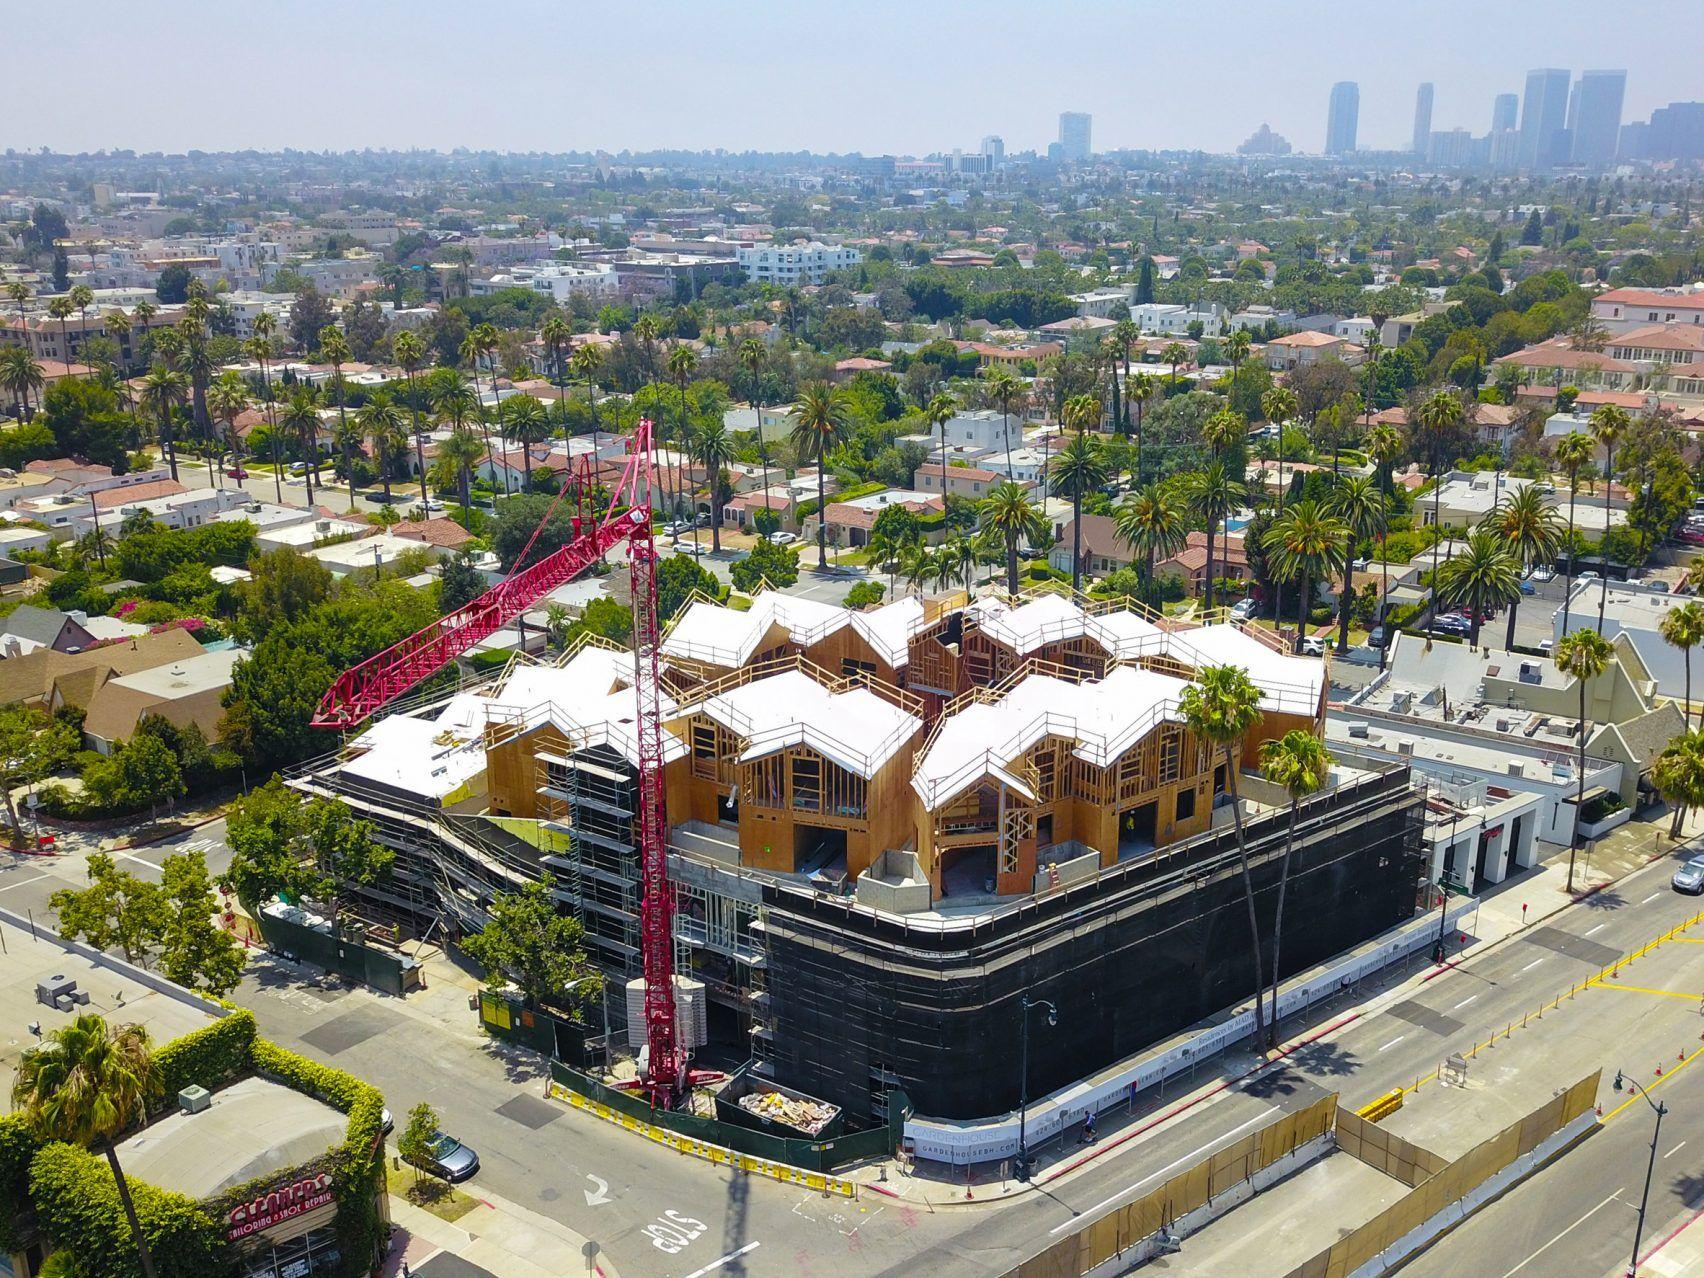 Gardenhouse Mad Architects Architect Architecture Beverly Hills